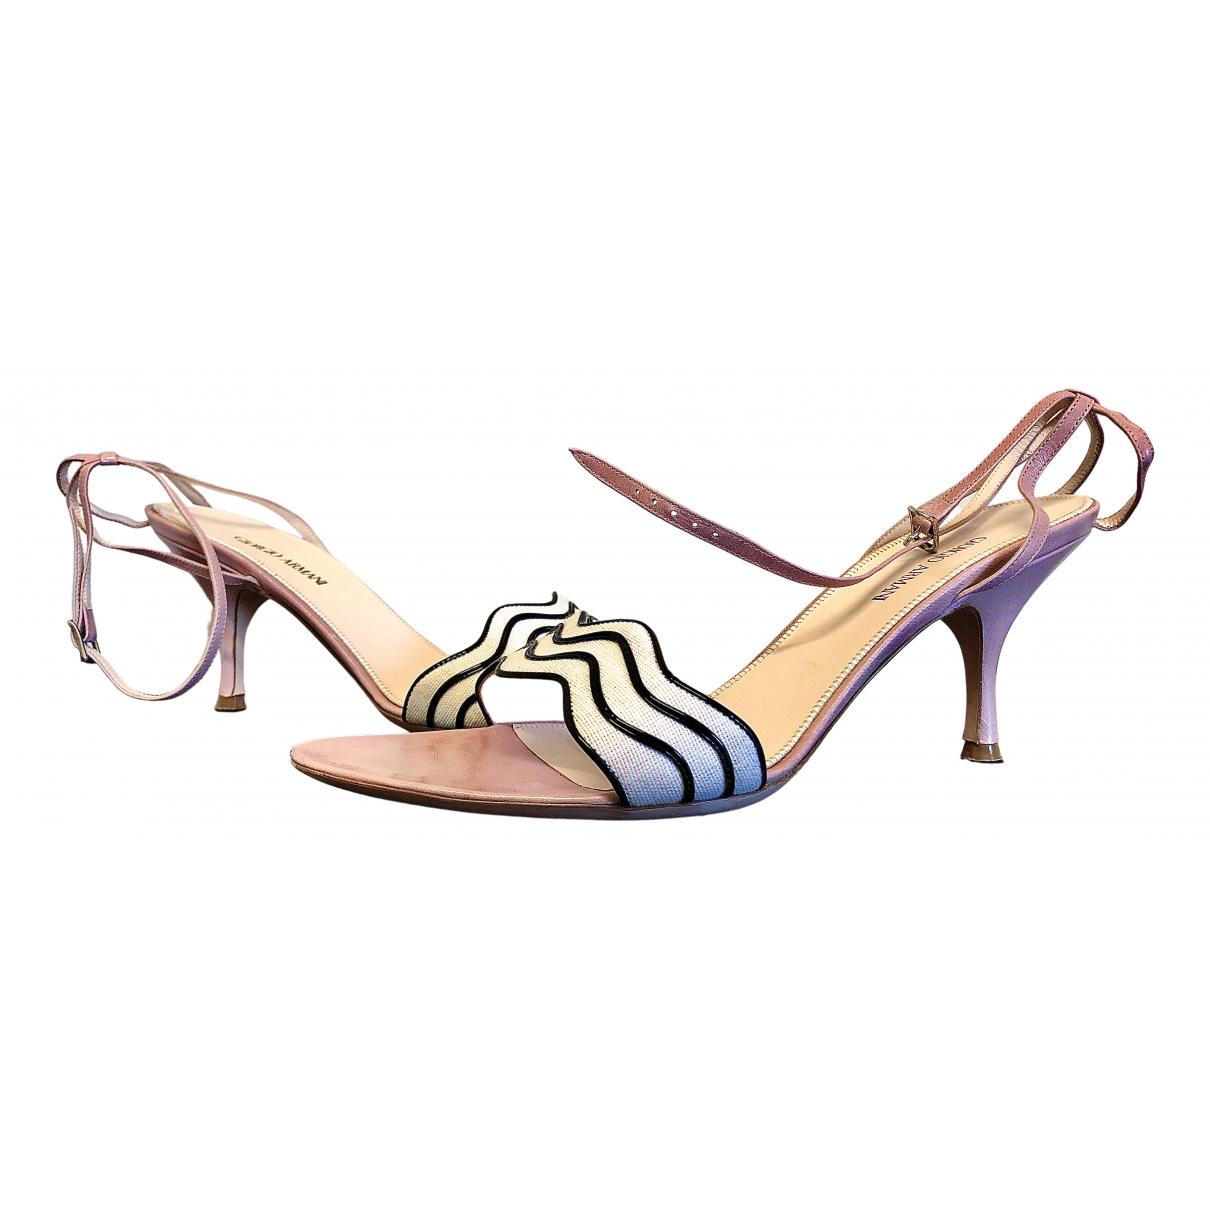 Giorgio Armani N Pink Leather Sandals for Women 38.5 EU